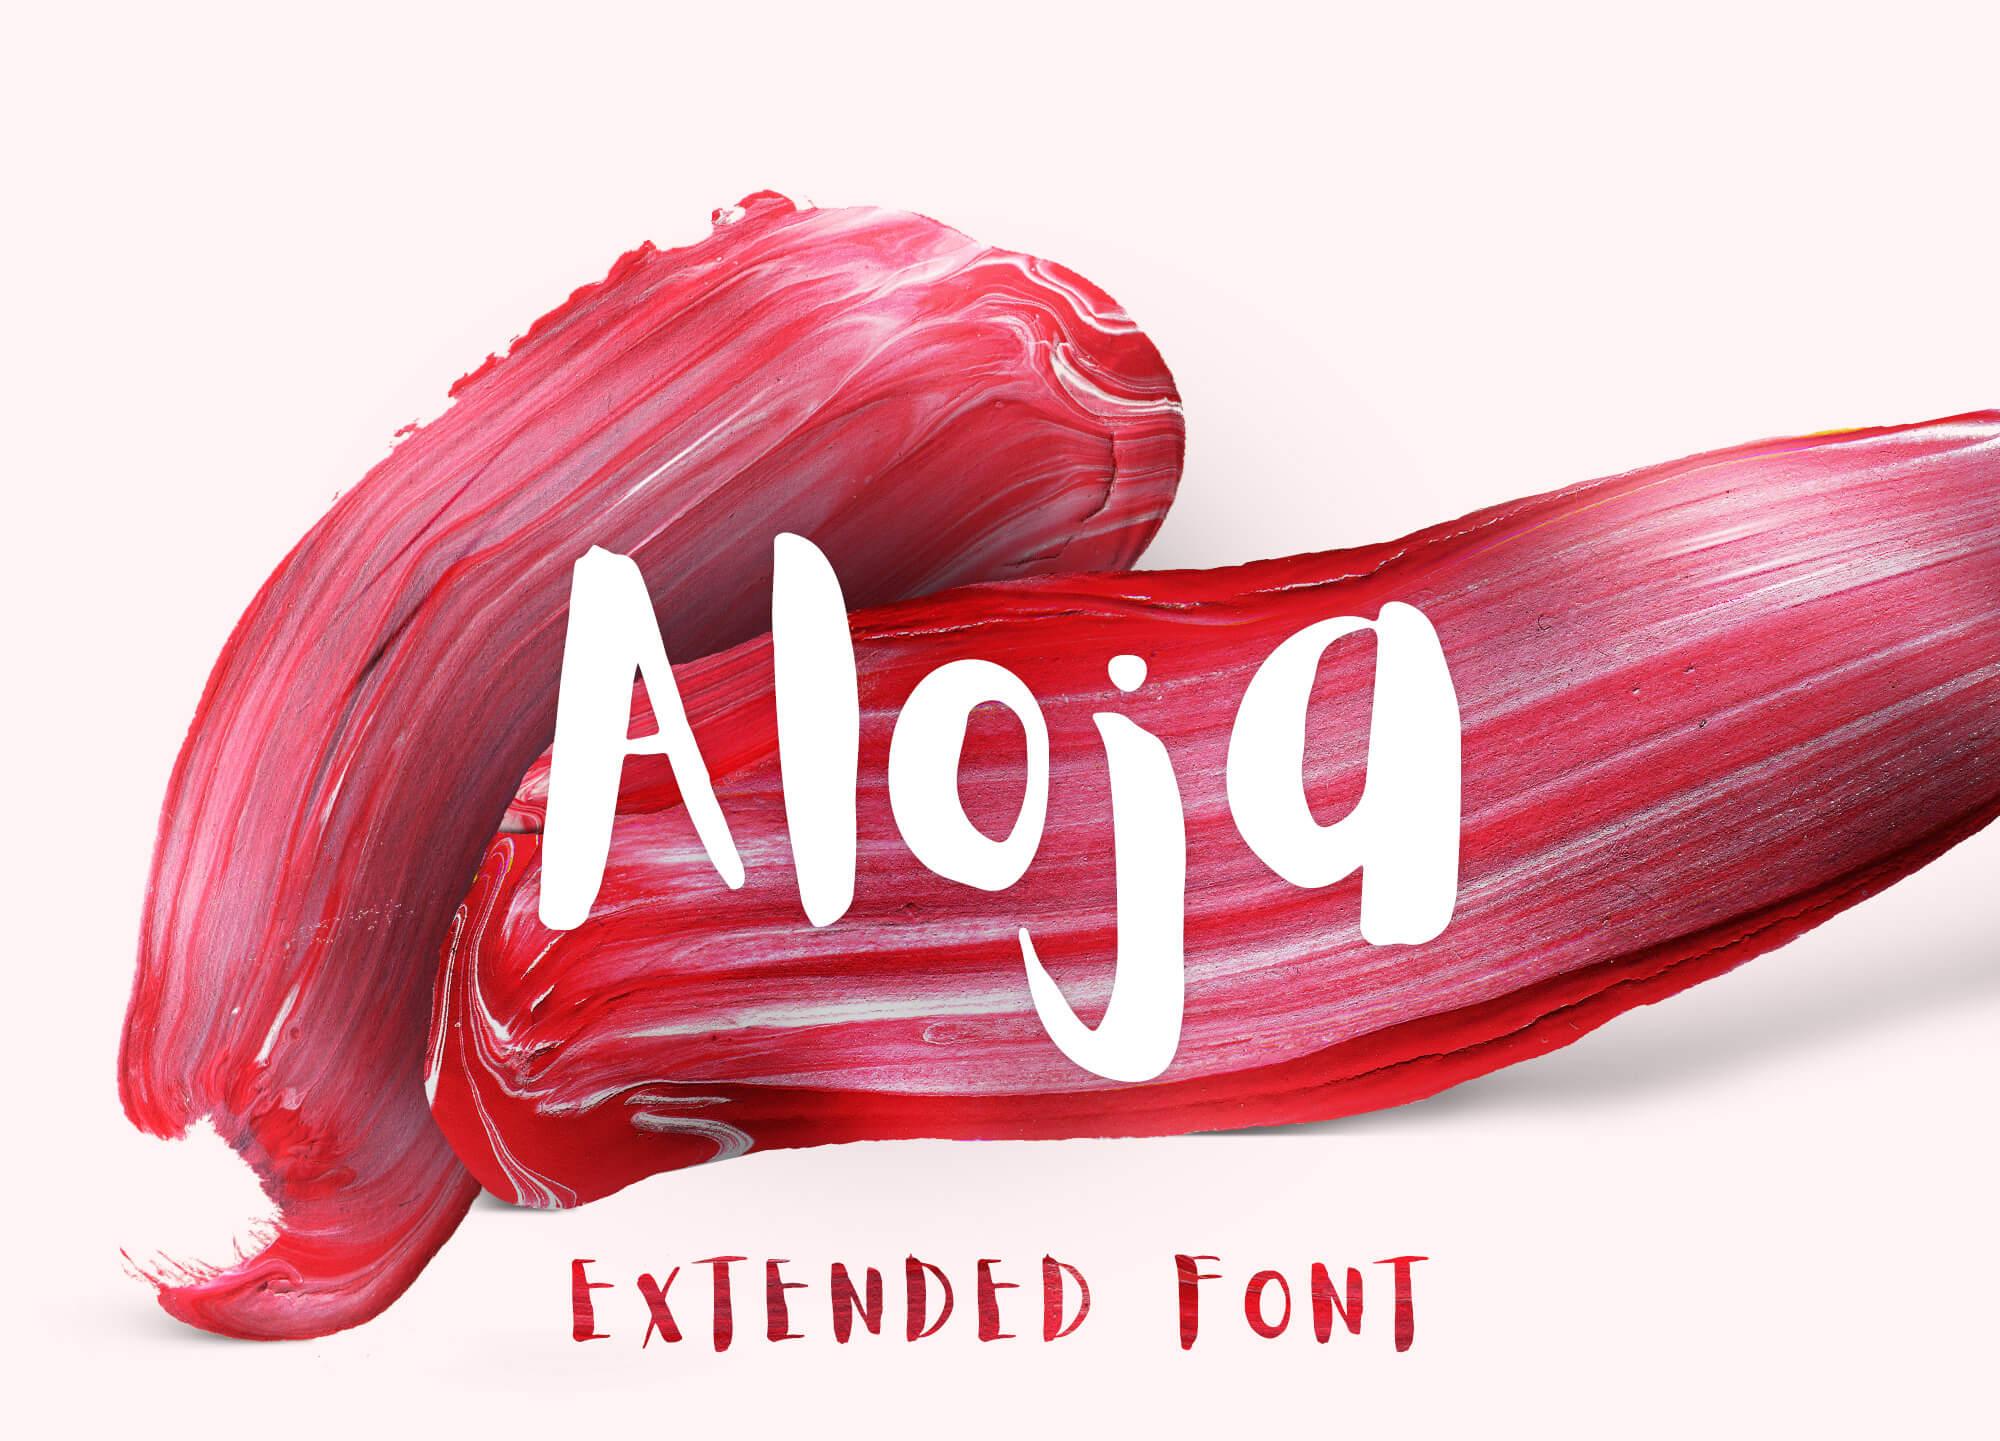 ALOJA Extended Handwriting Font